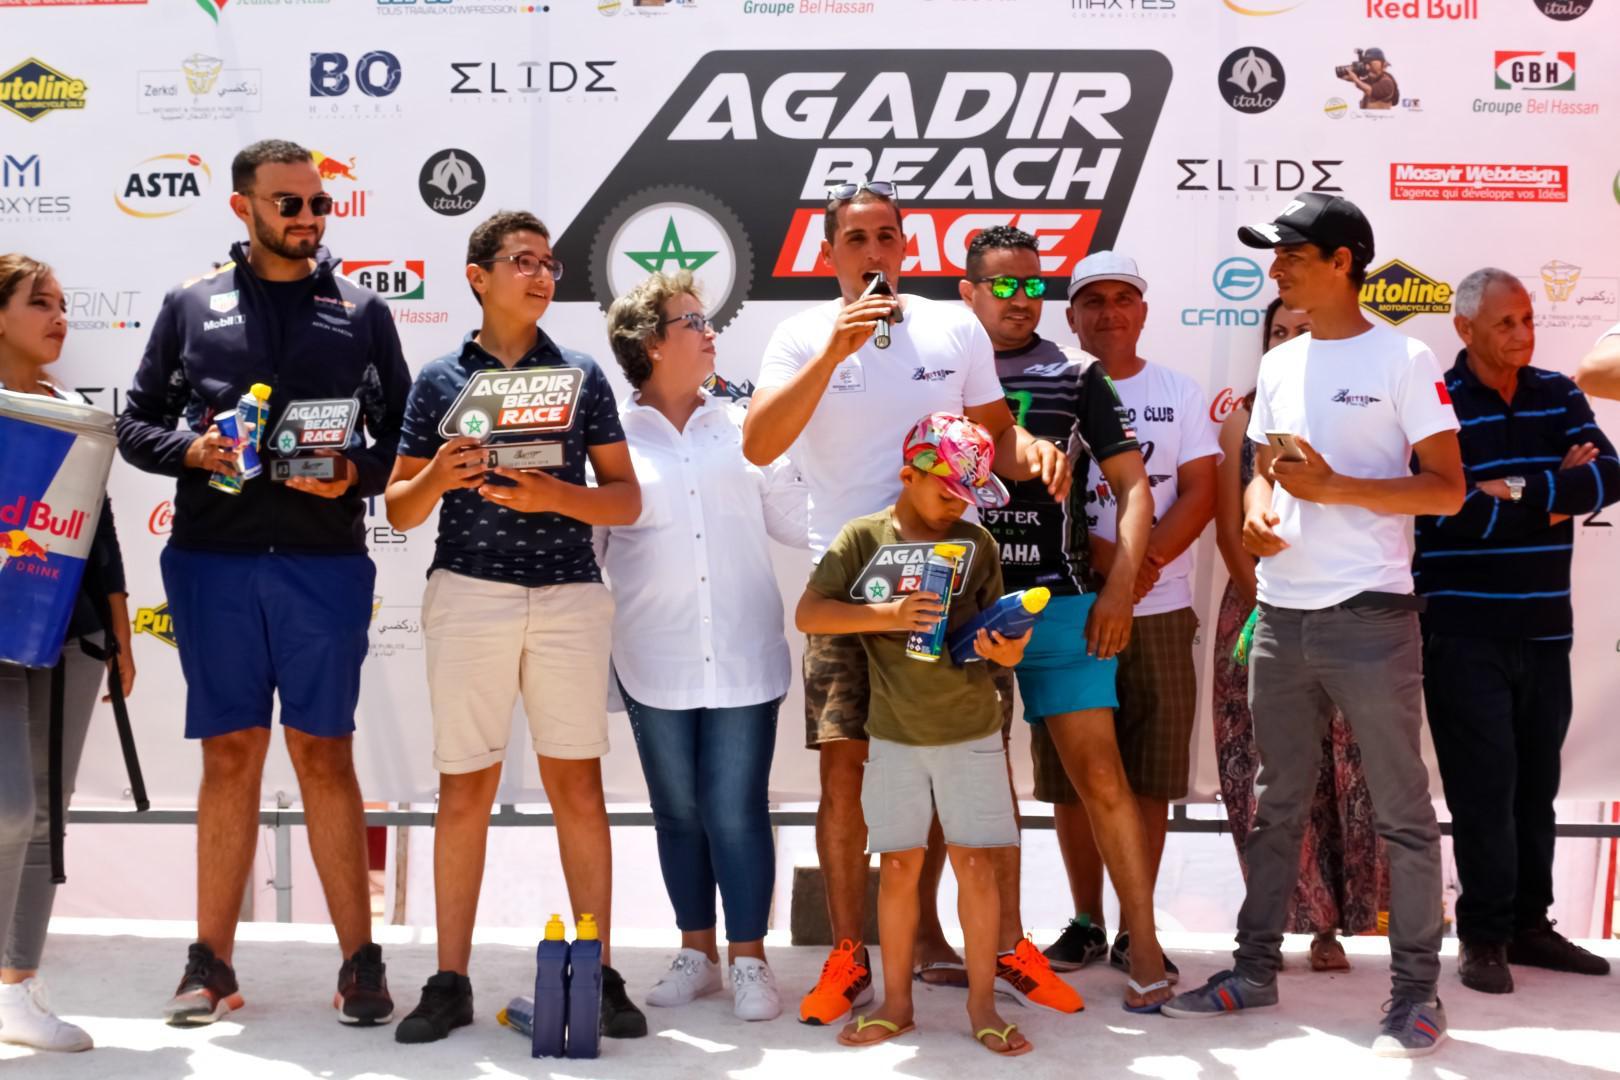 agadir-beach-race-la-reussite-791-12.jpg